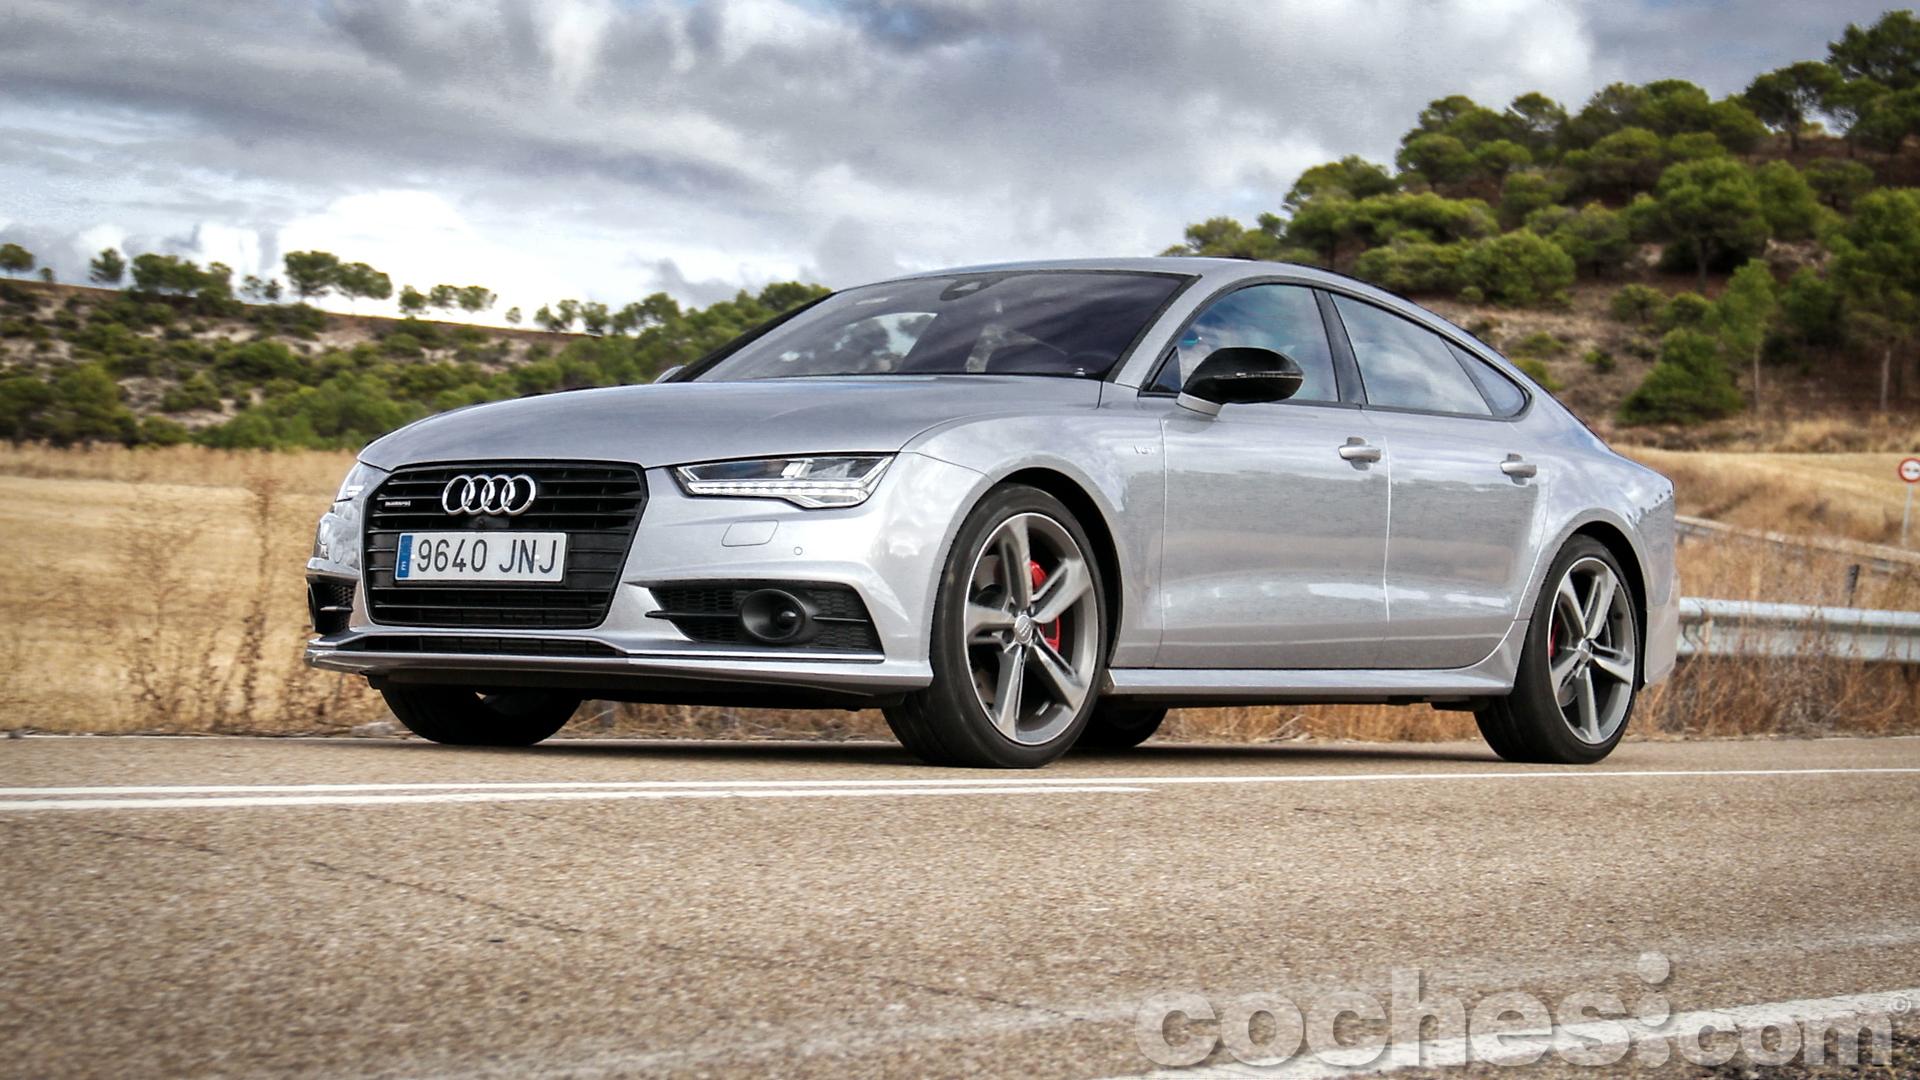 Audi_A7_Sportback_3.0_BiTDI_Competition_095